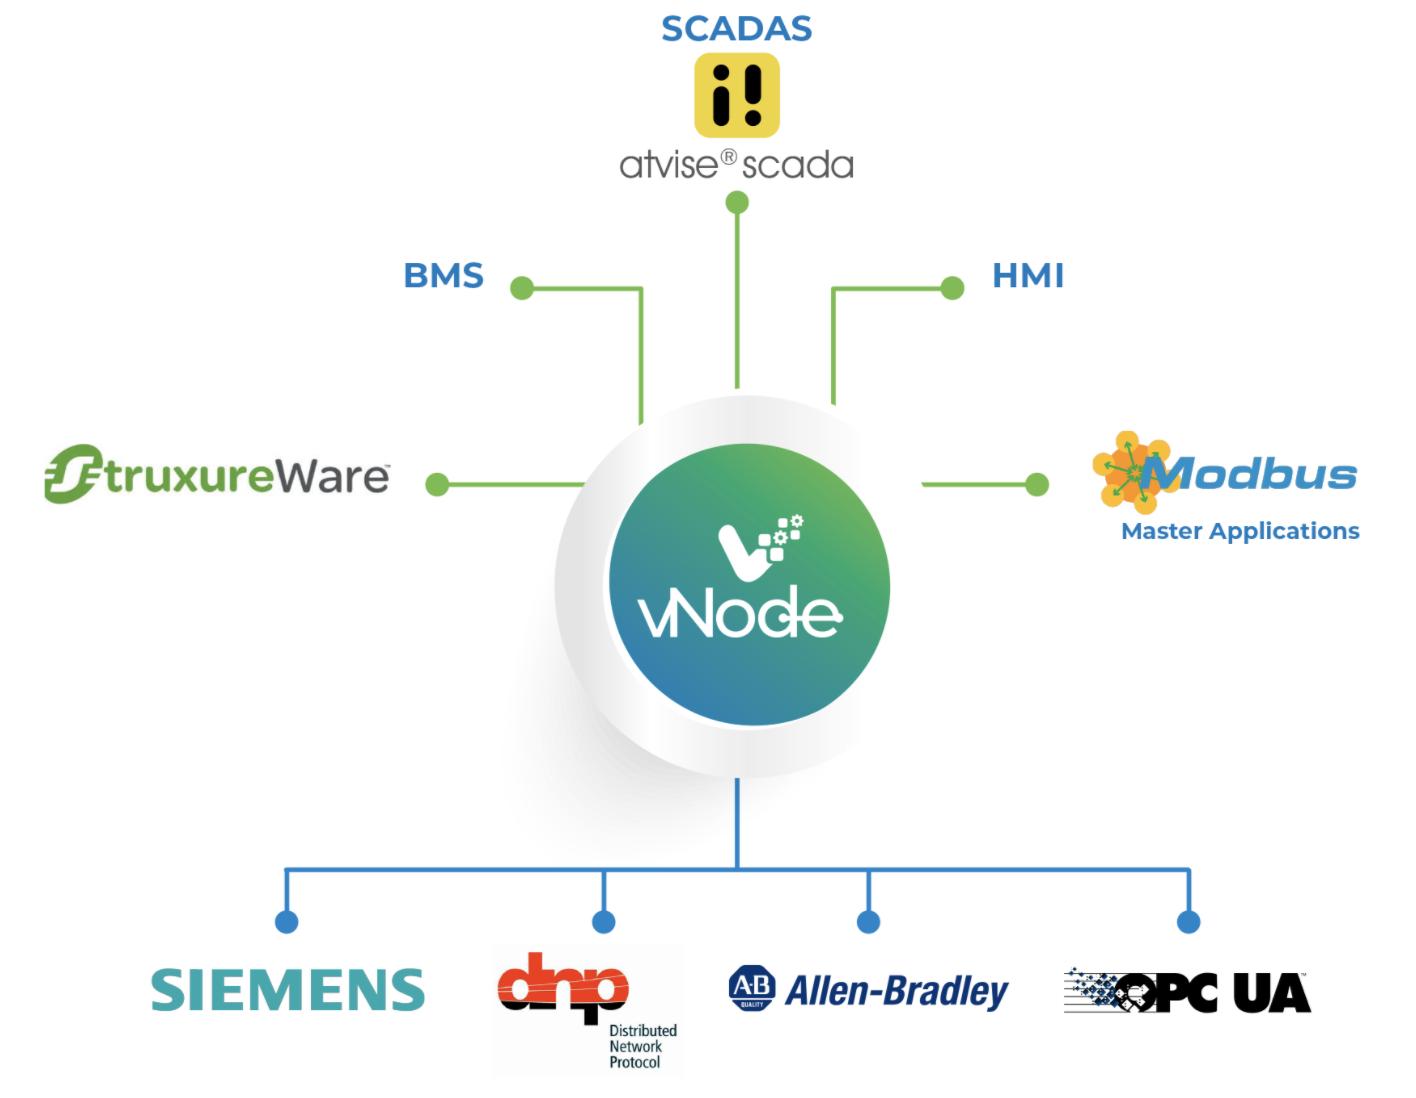 vNode modbus module server